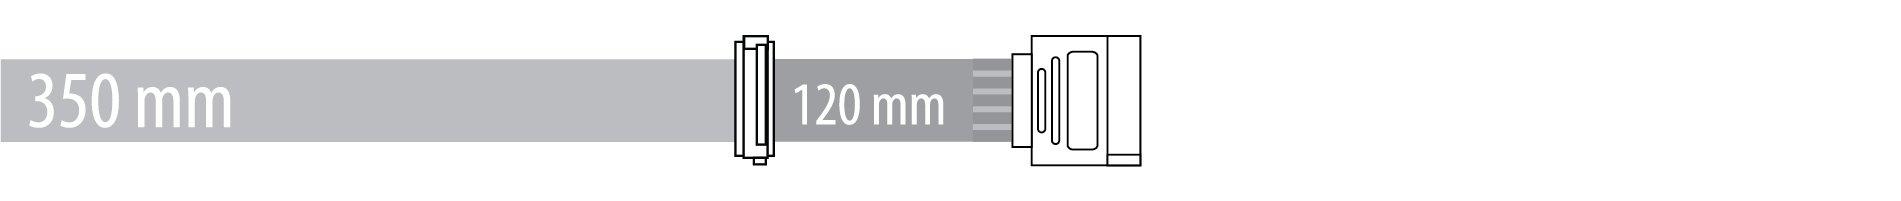 SATA 350 + 120 mm